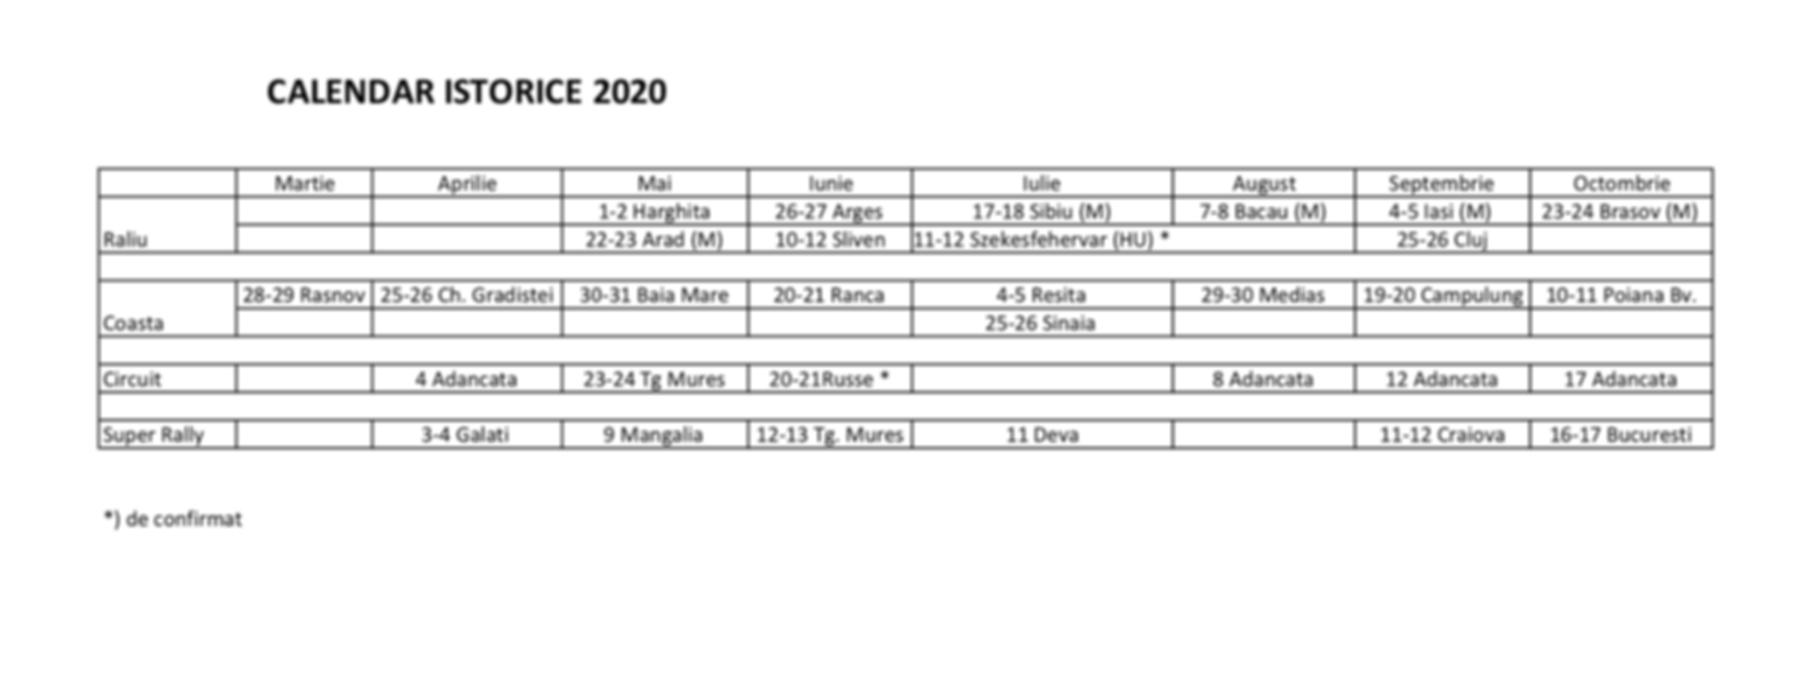 Calendar Istorice 2020.png